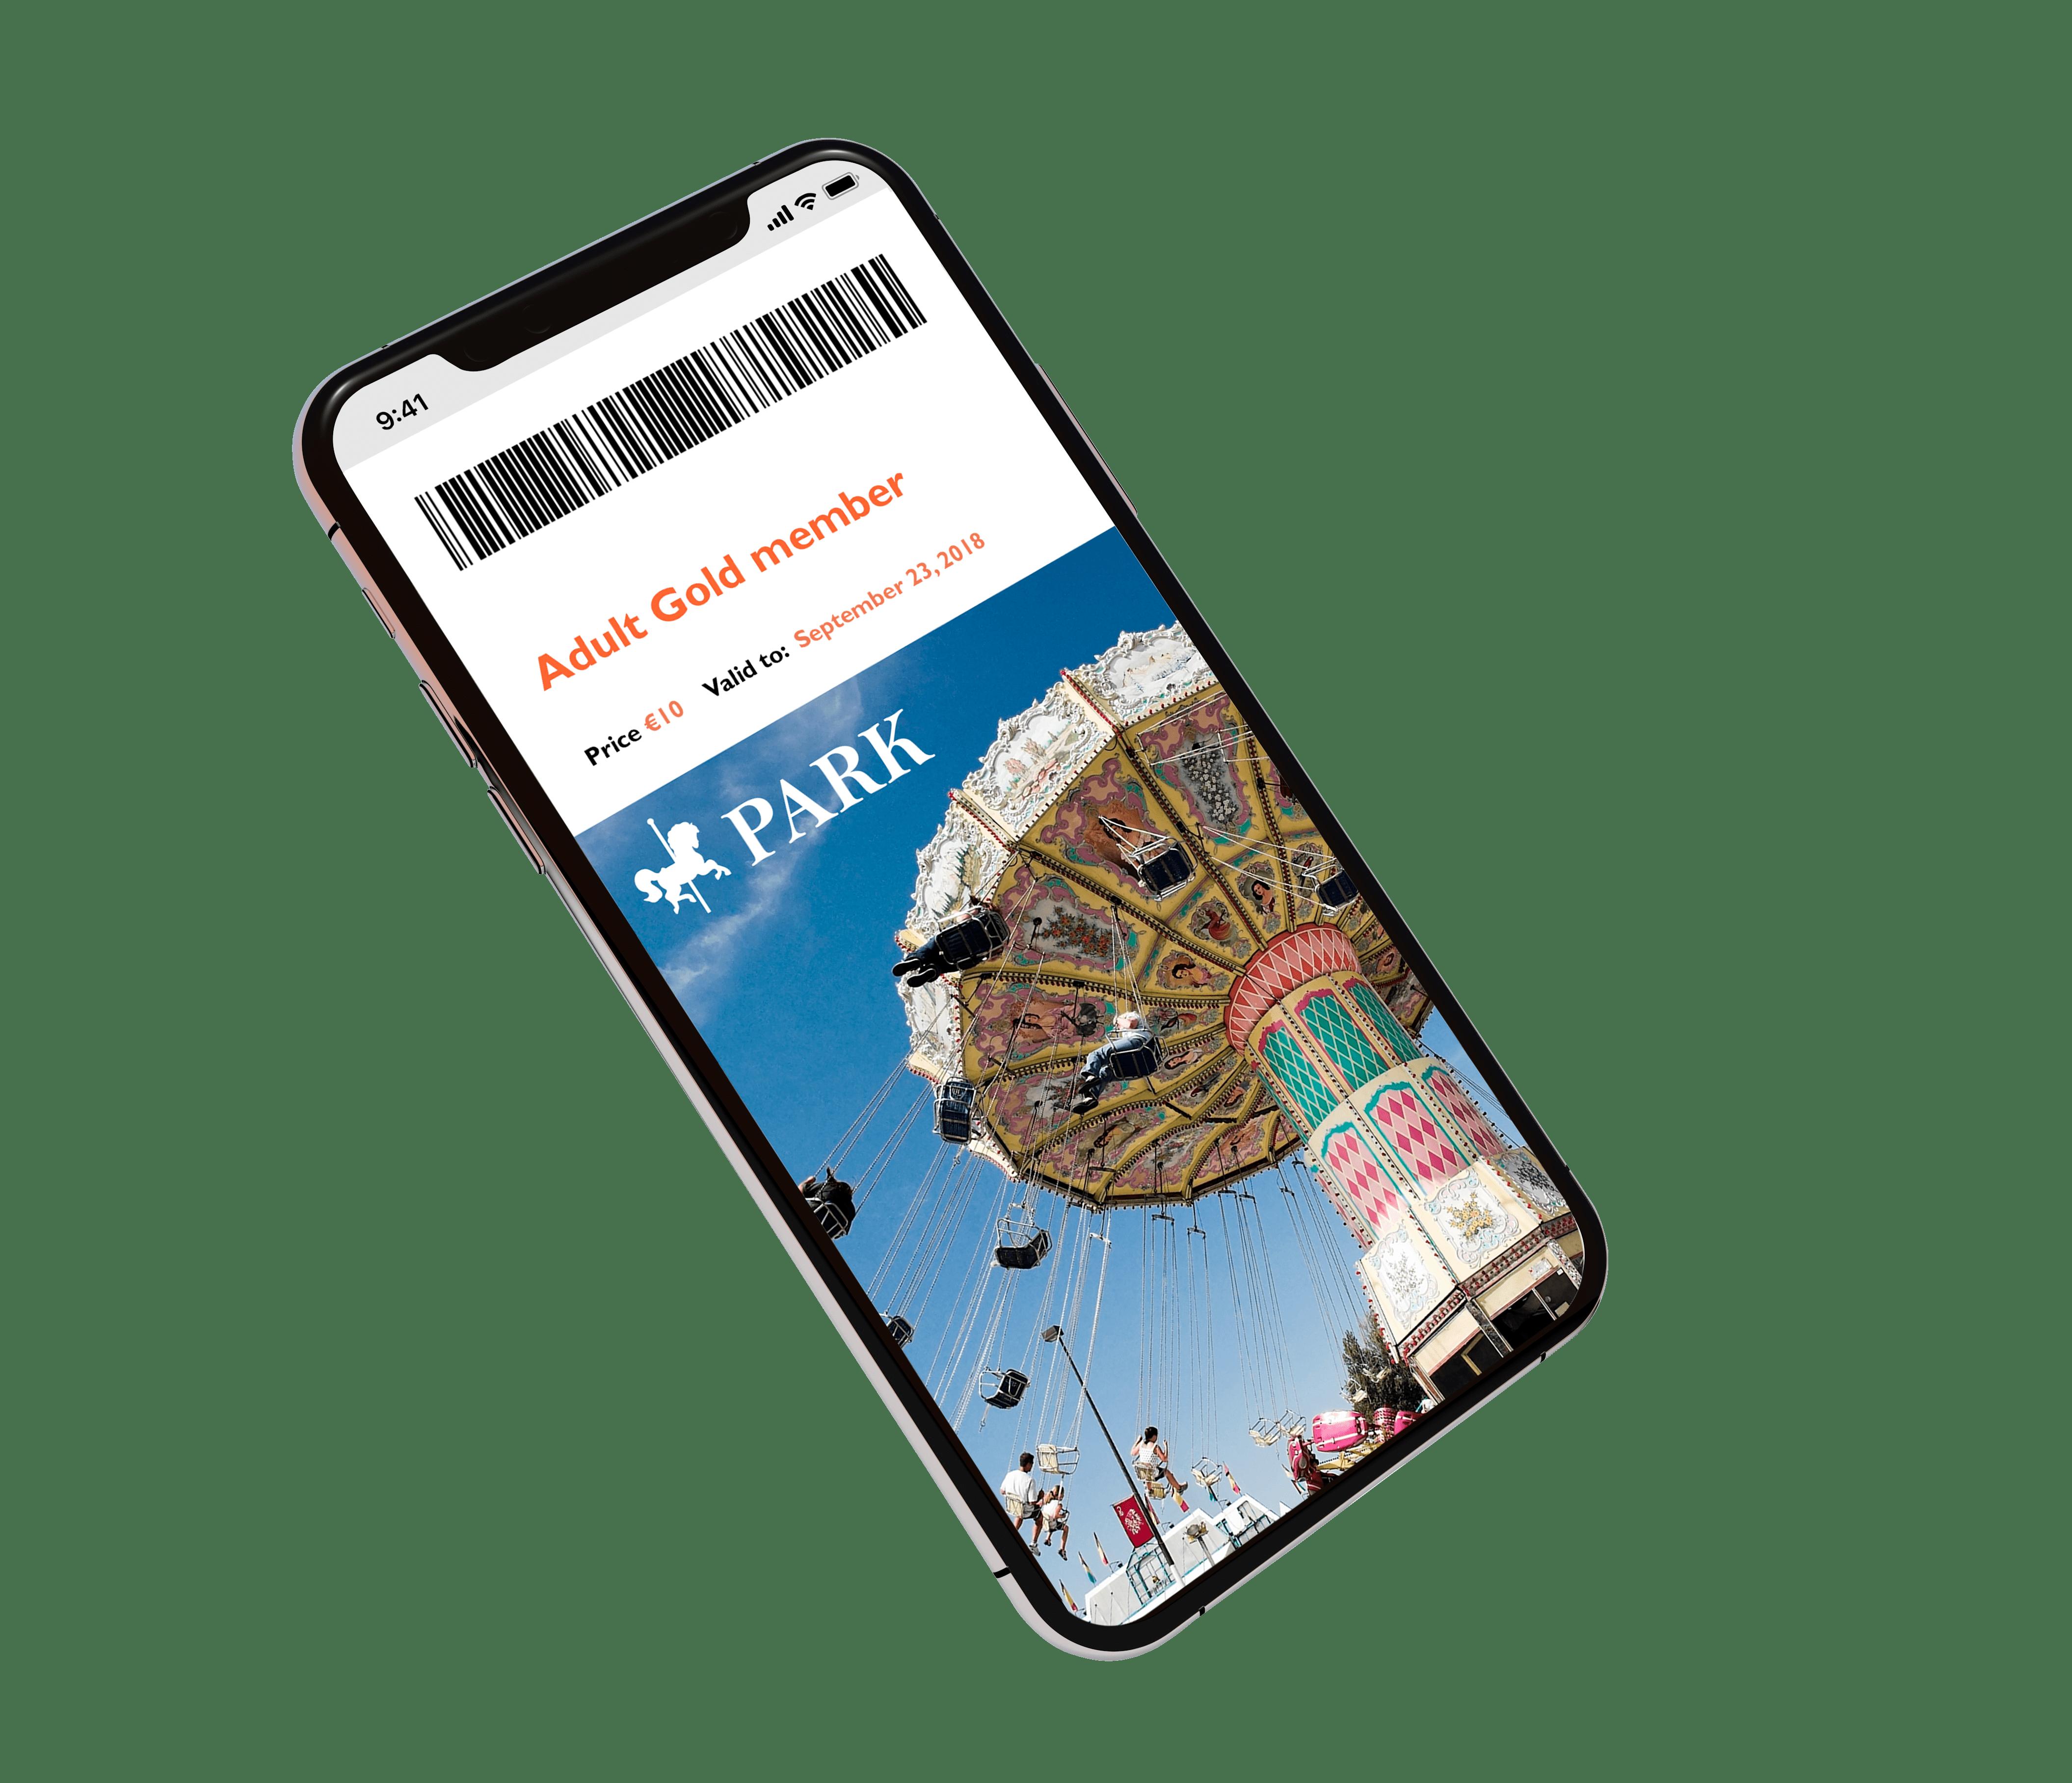 Theme park ticket displayed in digital mobile wallet